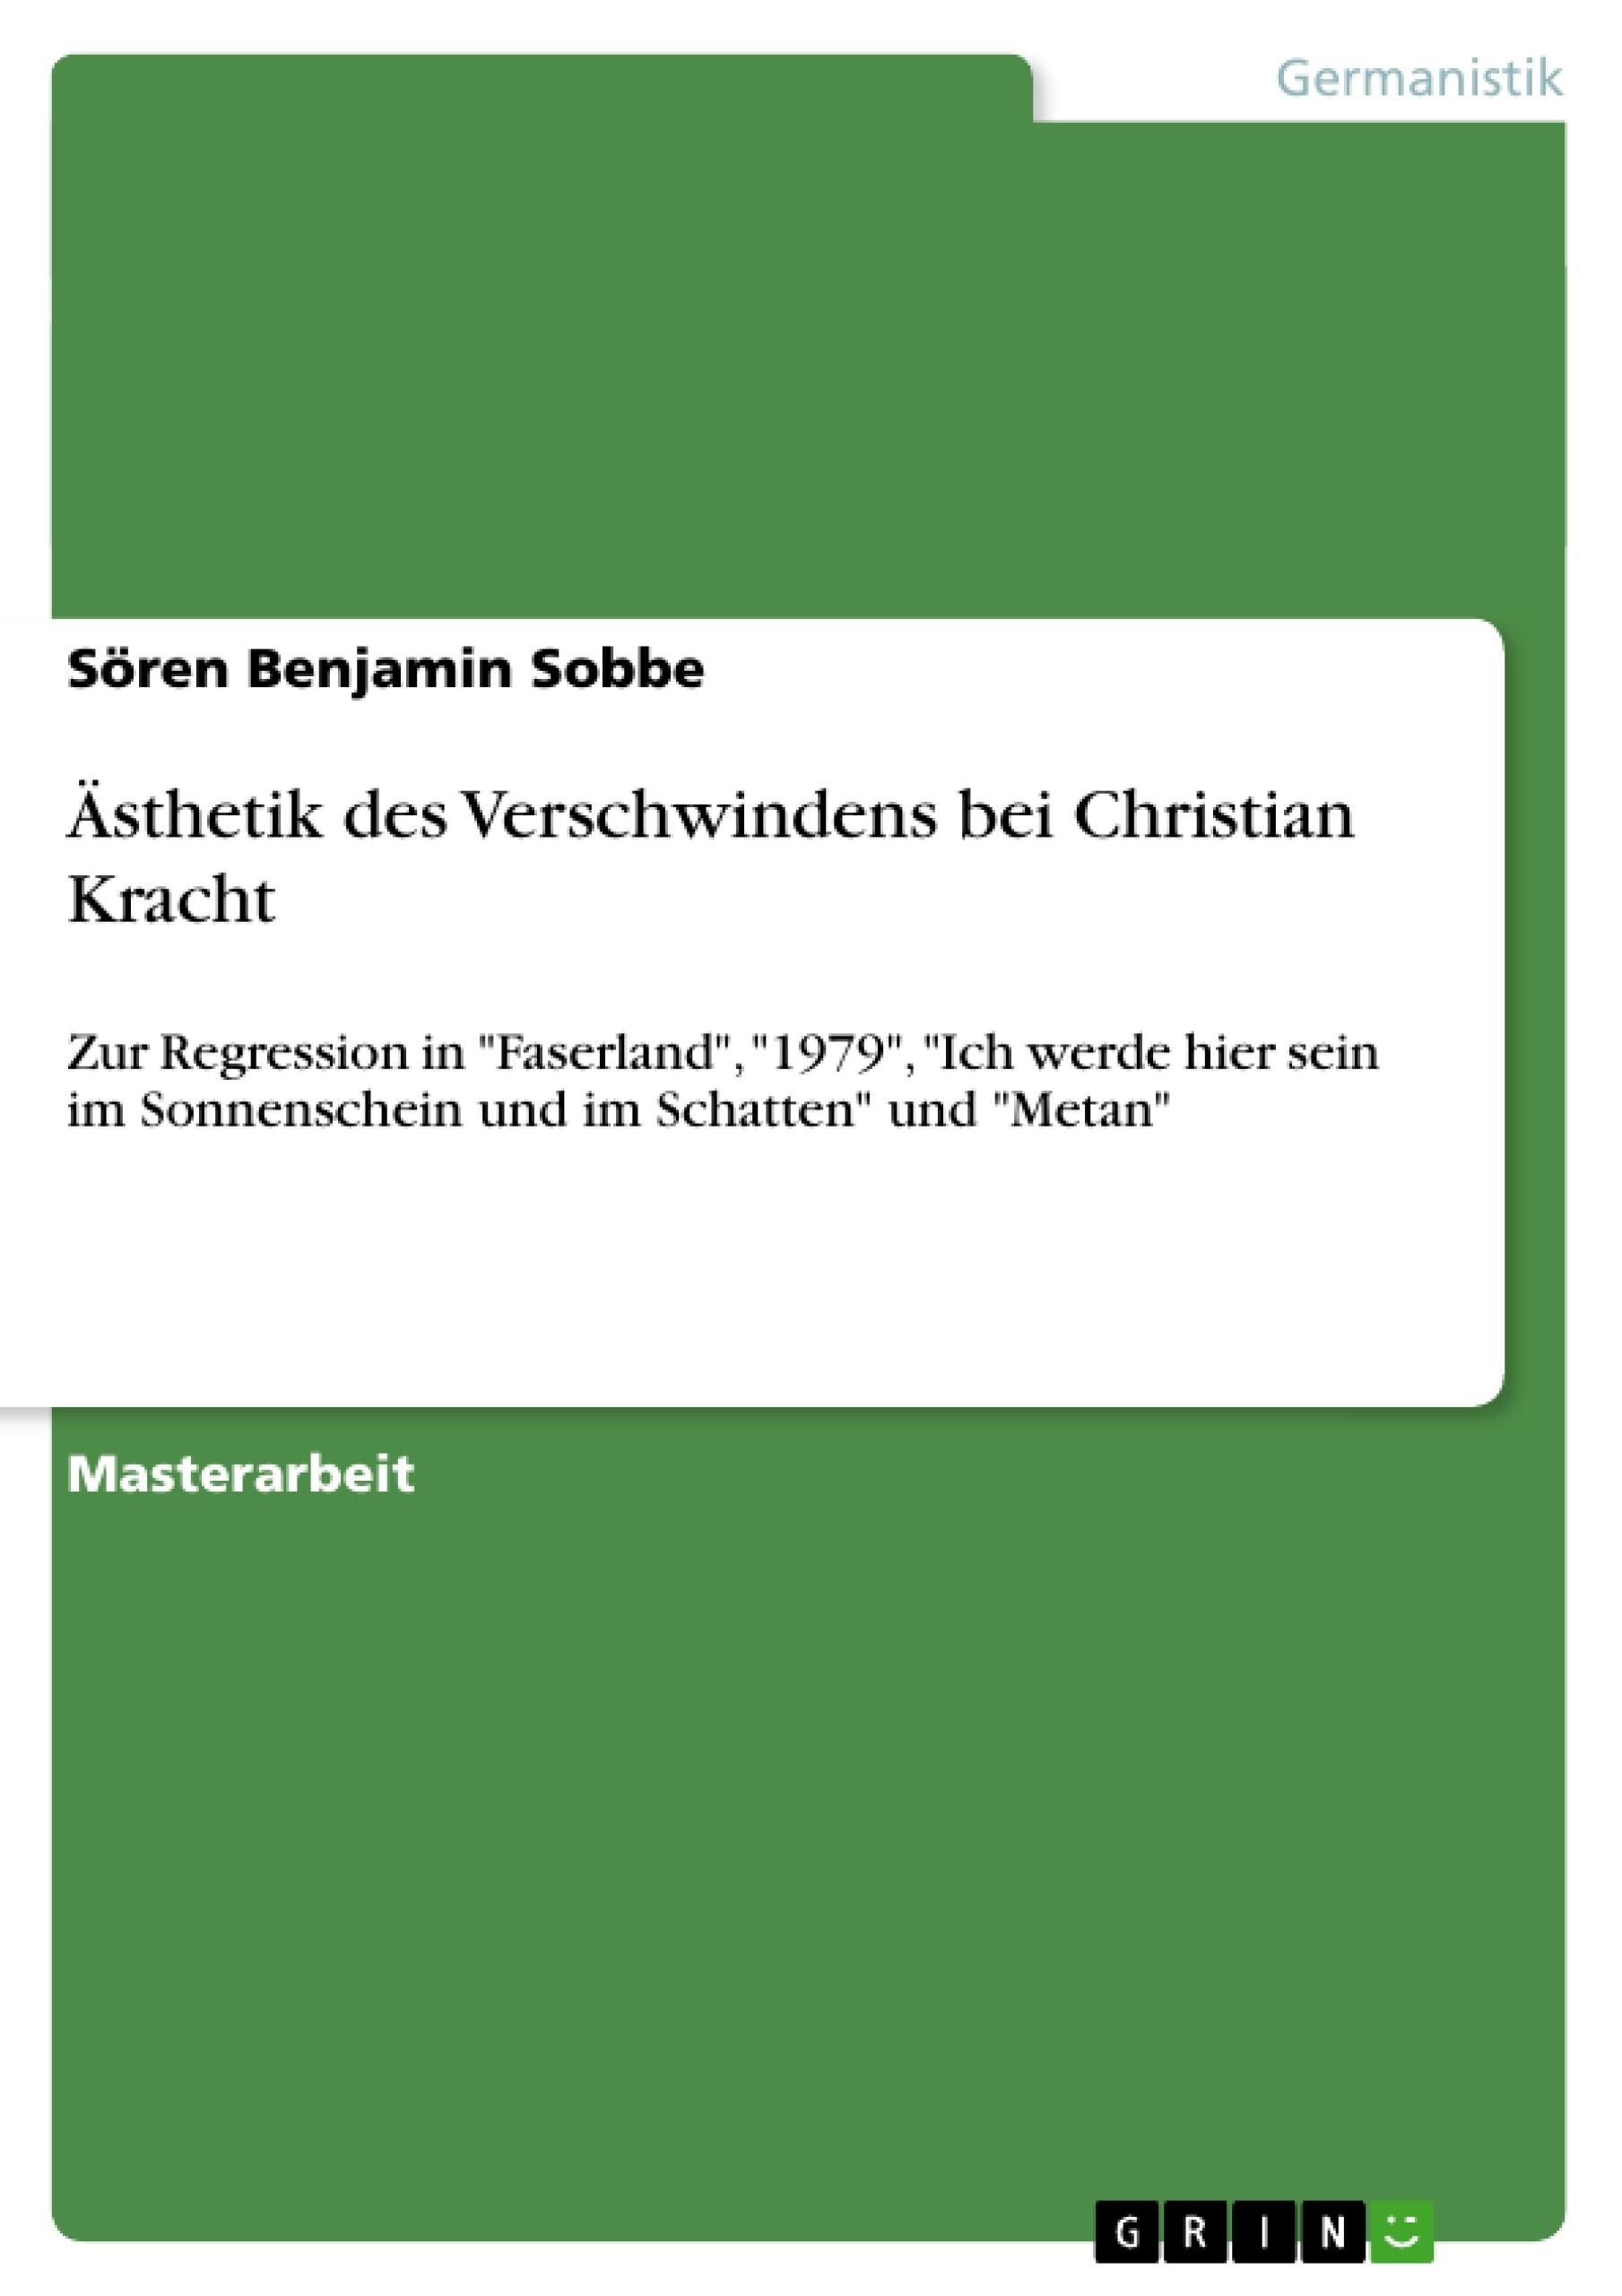 Titel: Ästhetik des Verschwindens bei Christian Kracht